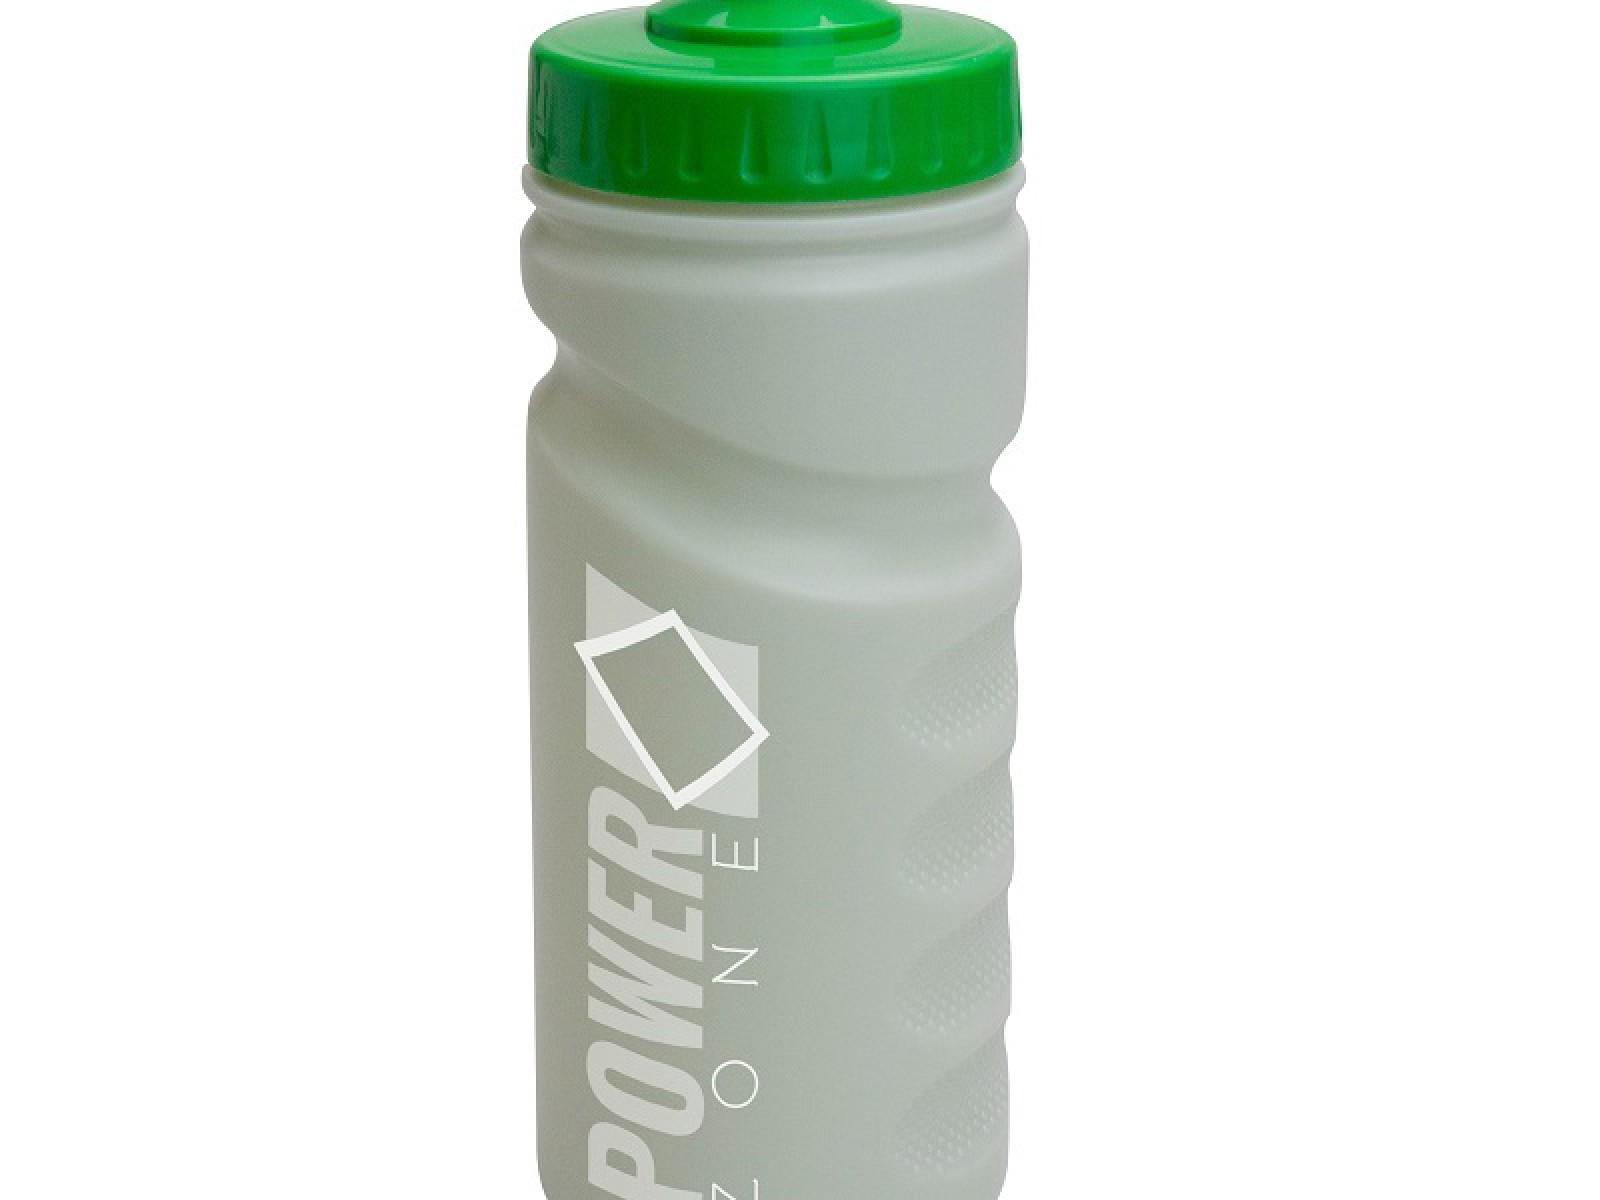 500ml-eco-sports-bottle_A